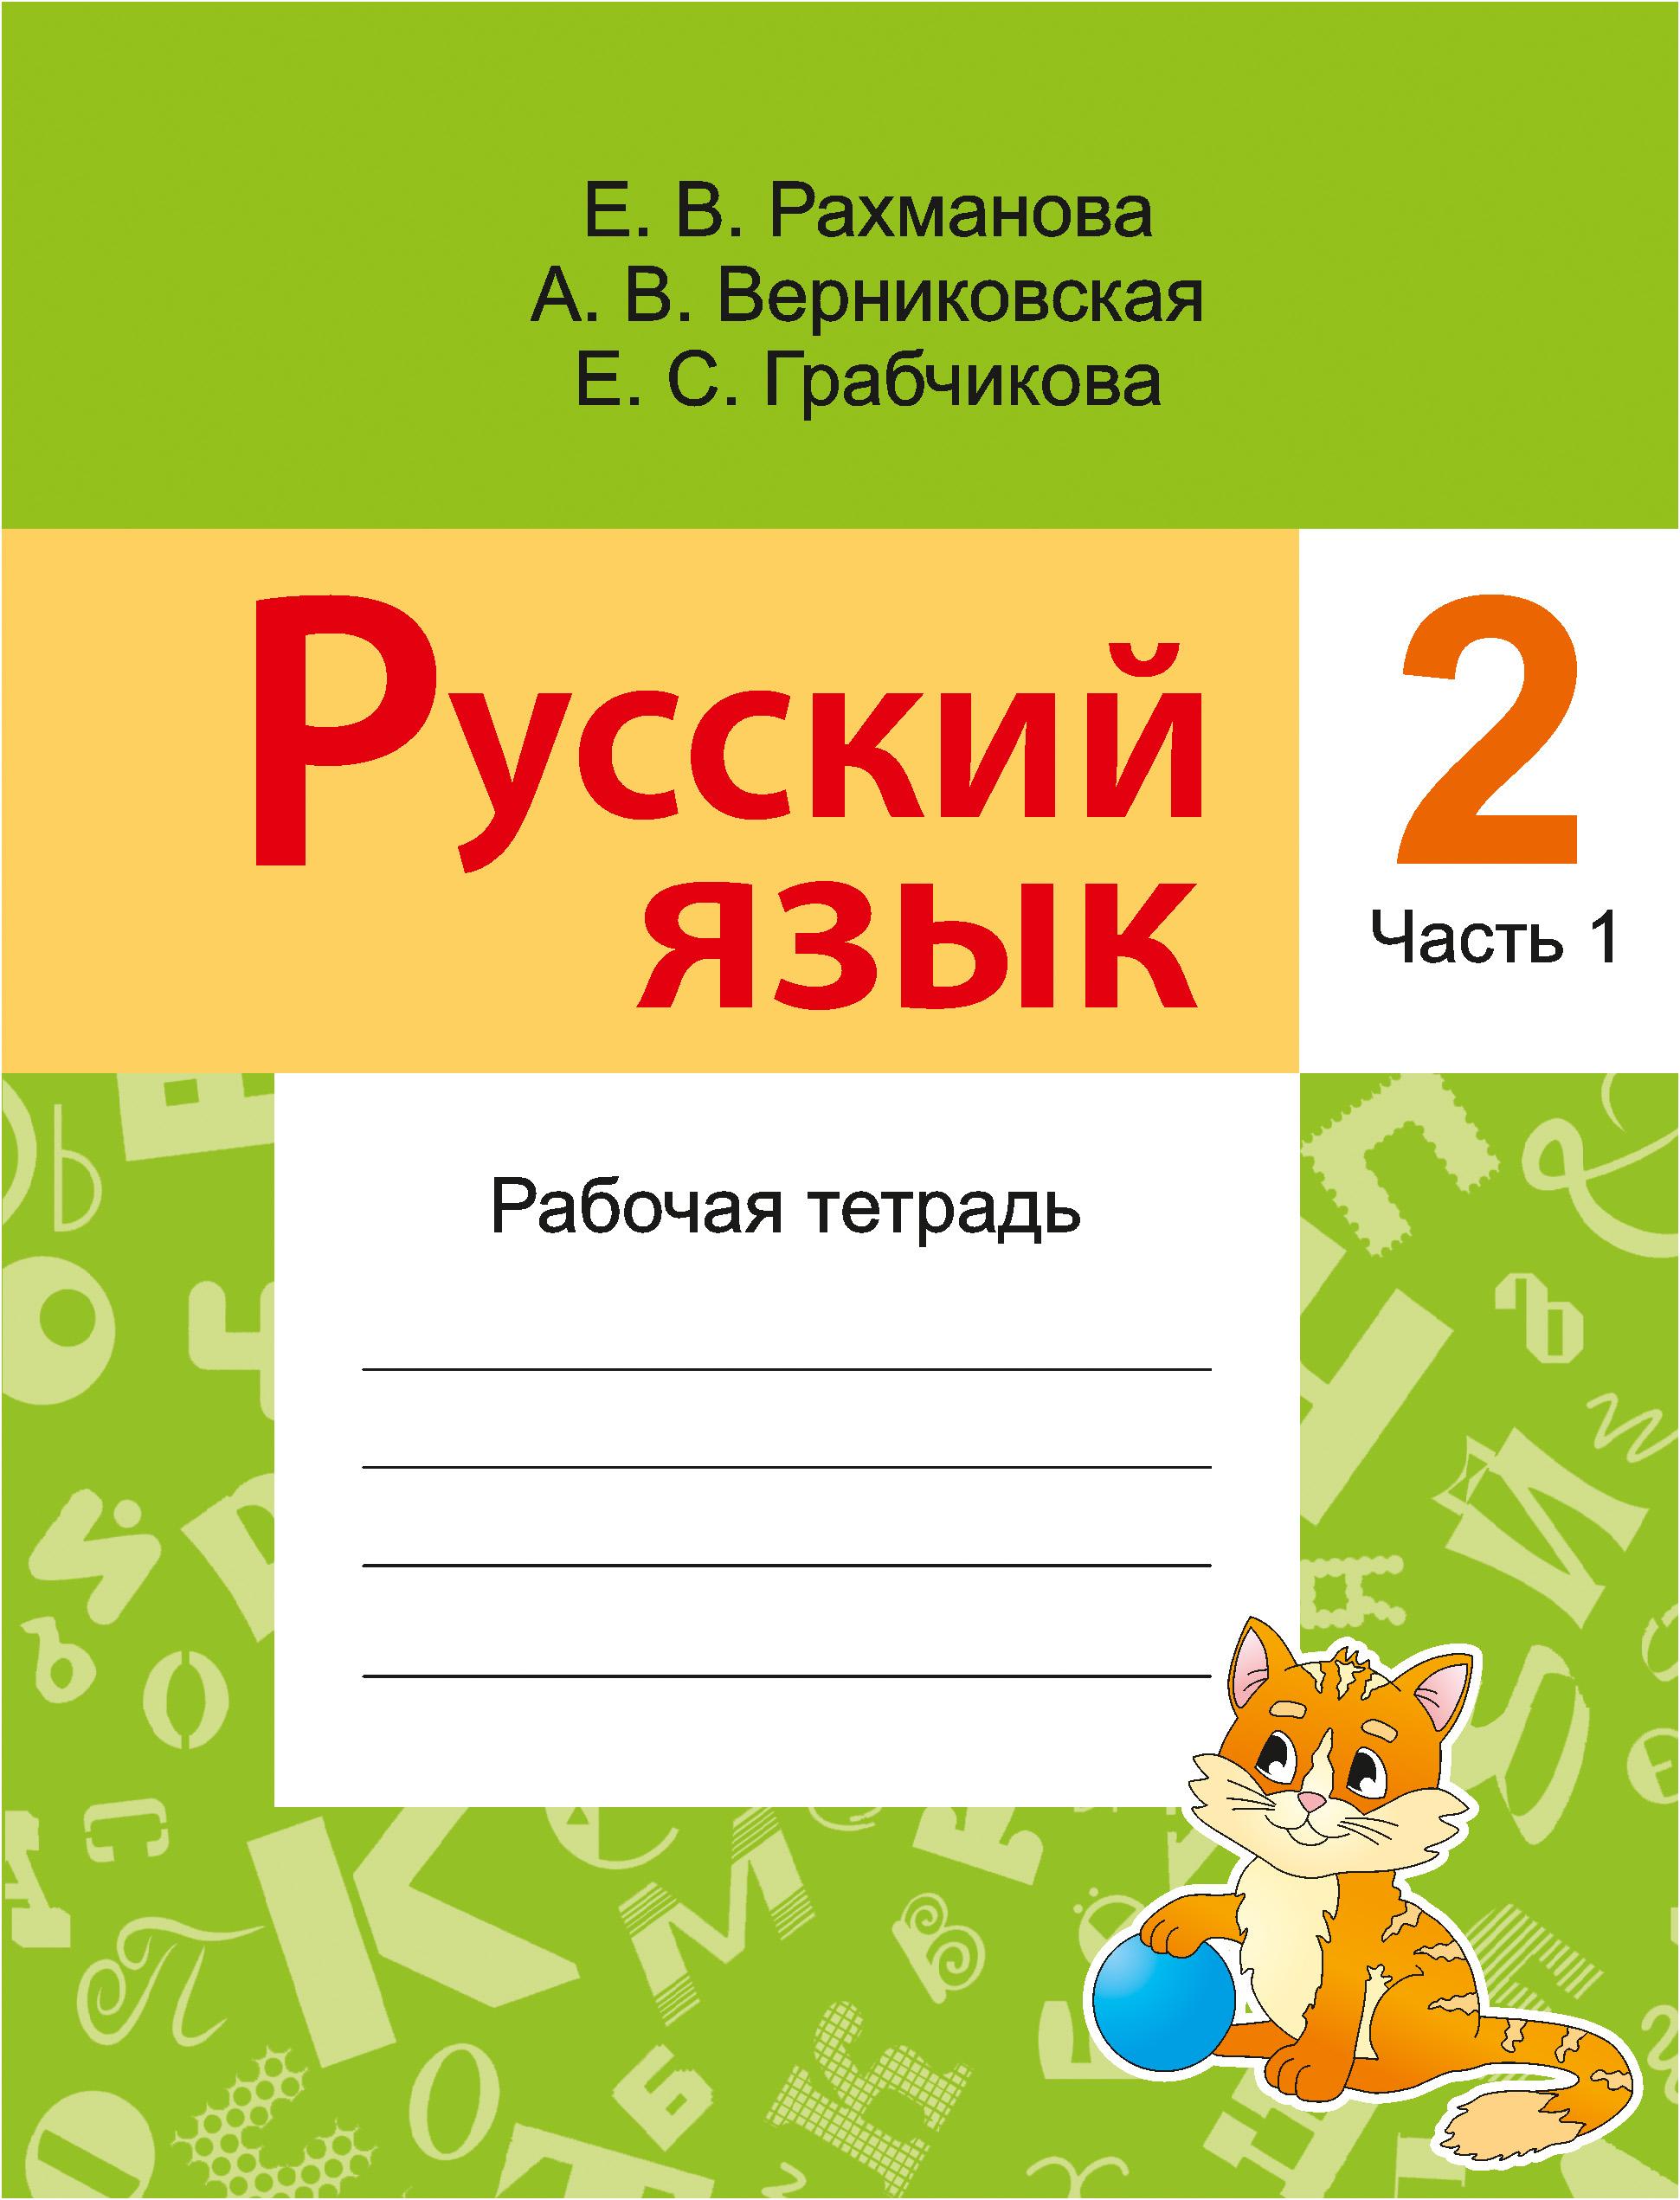 Русский язык, 2 кл. Рабочая тетрадь № 1